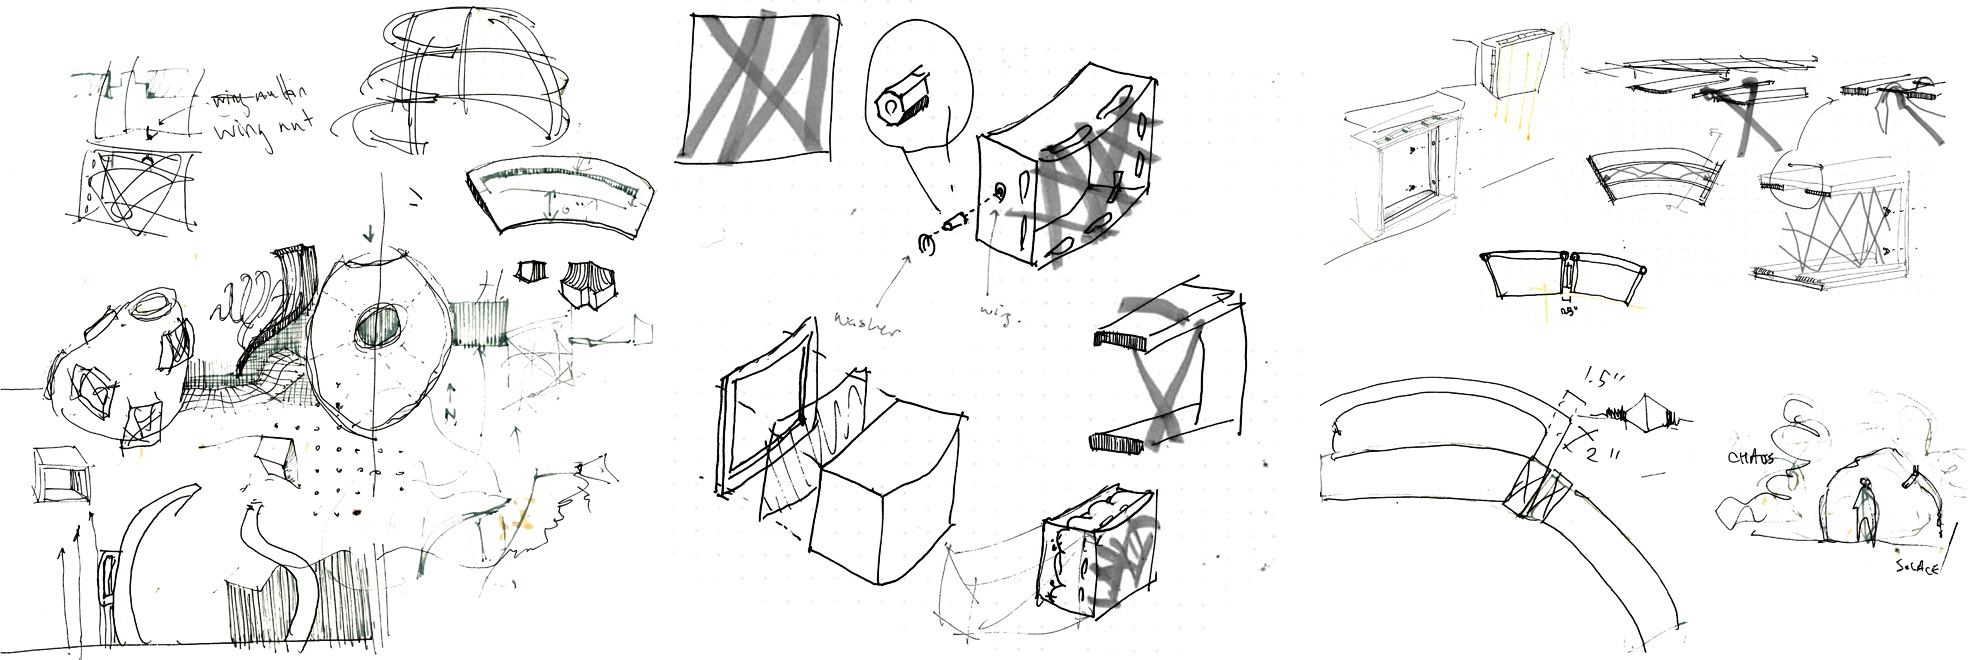 NEST-Concept-Sketches